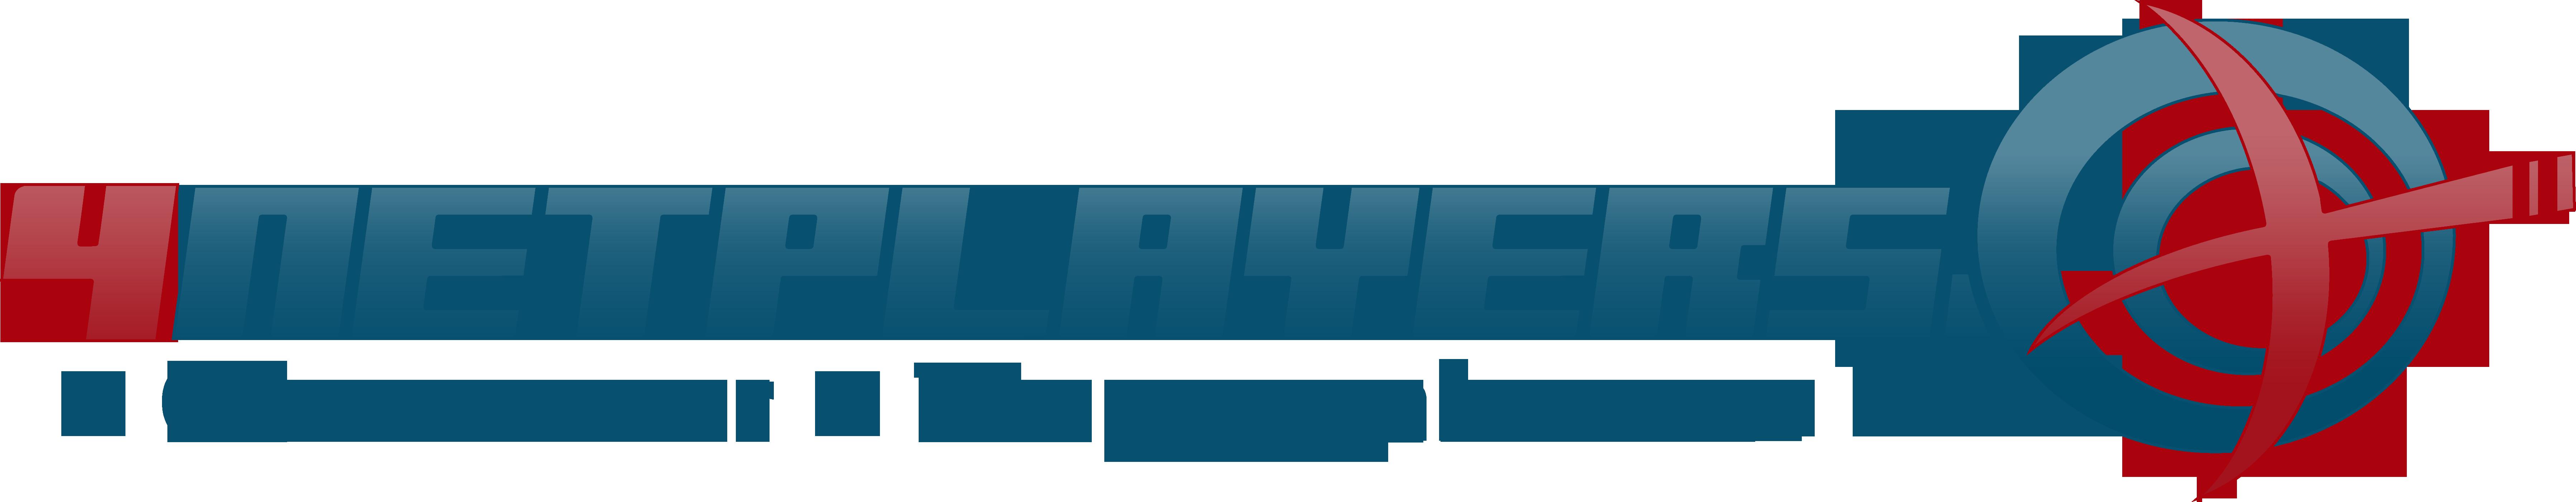 4Netplayers im Preisvergleich